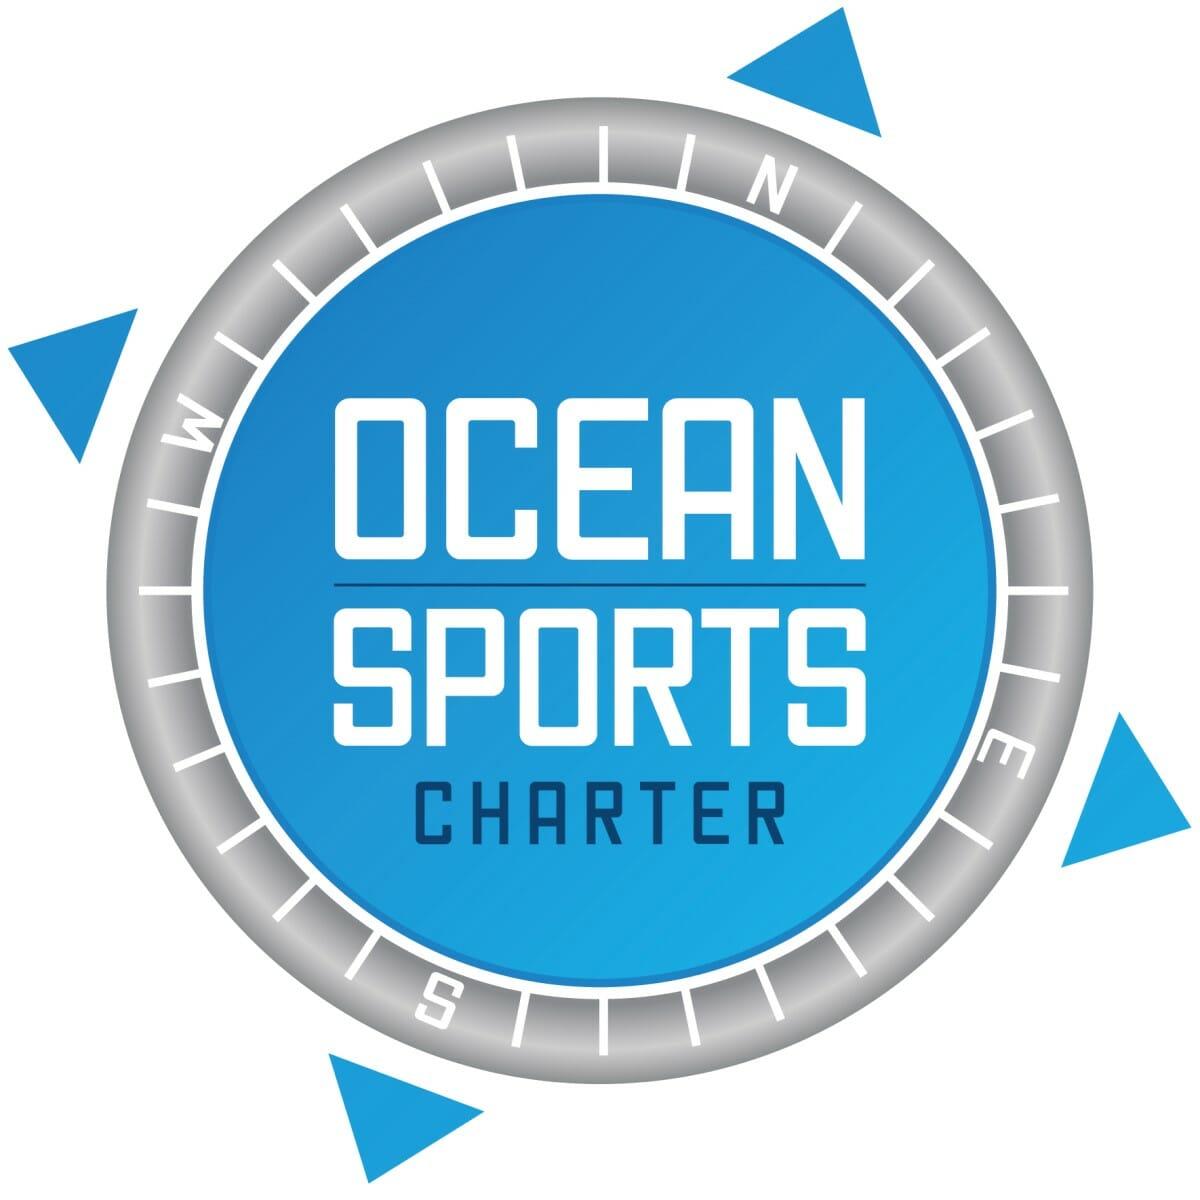 OCEAN SPORTS CHARTER LOGO